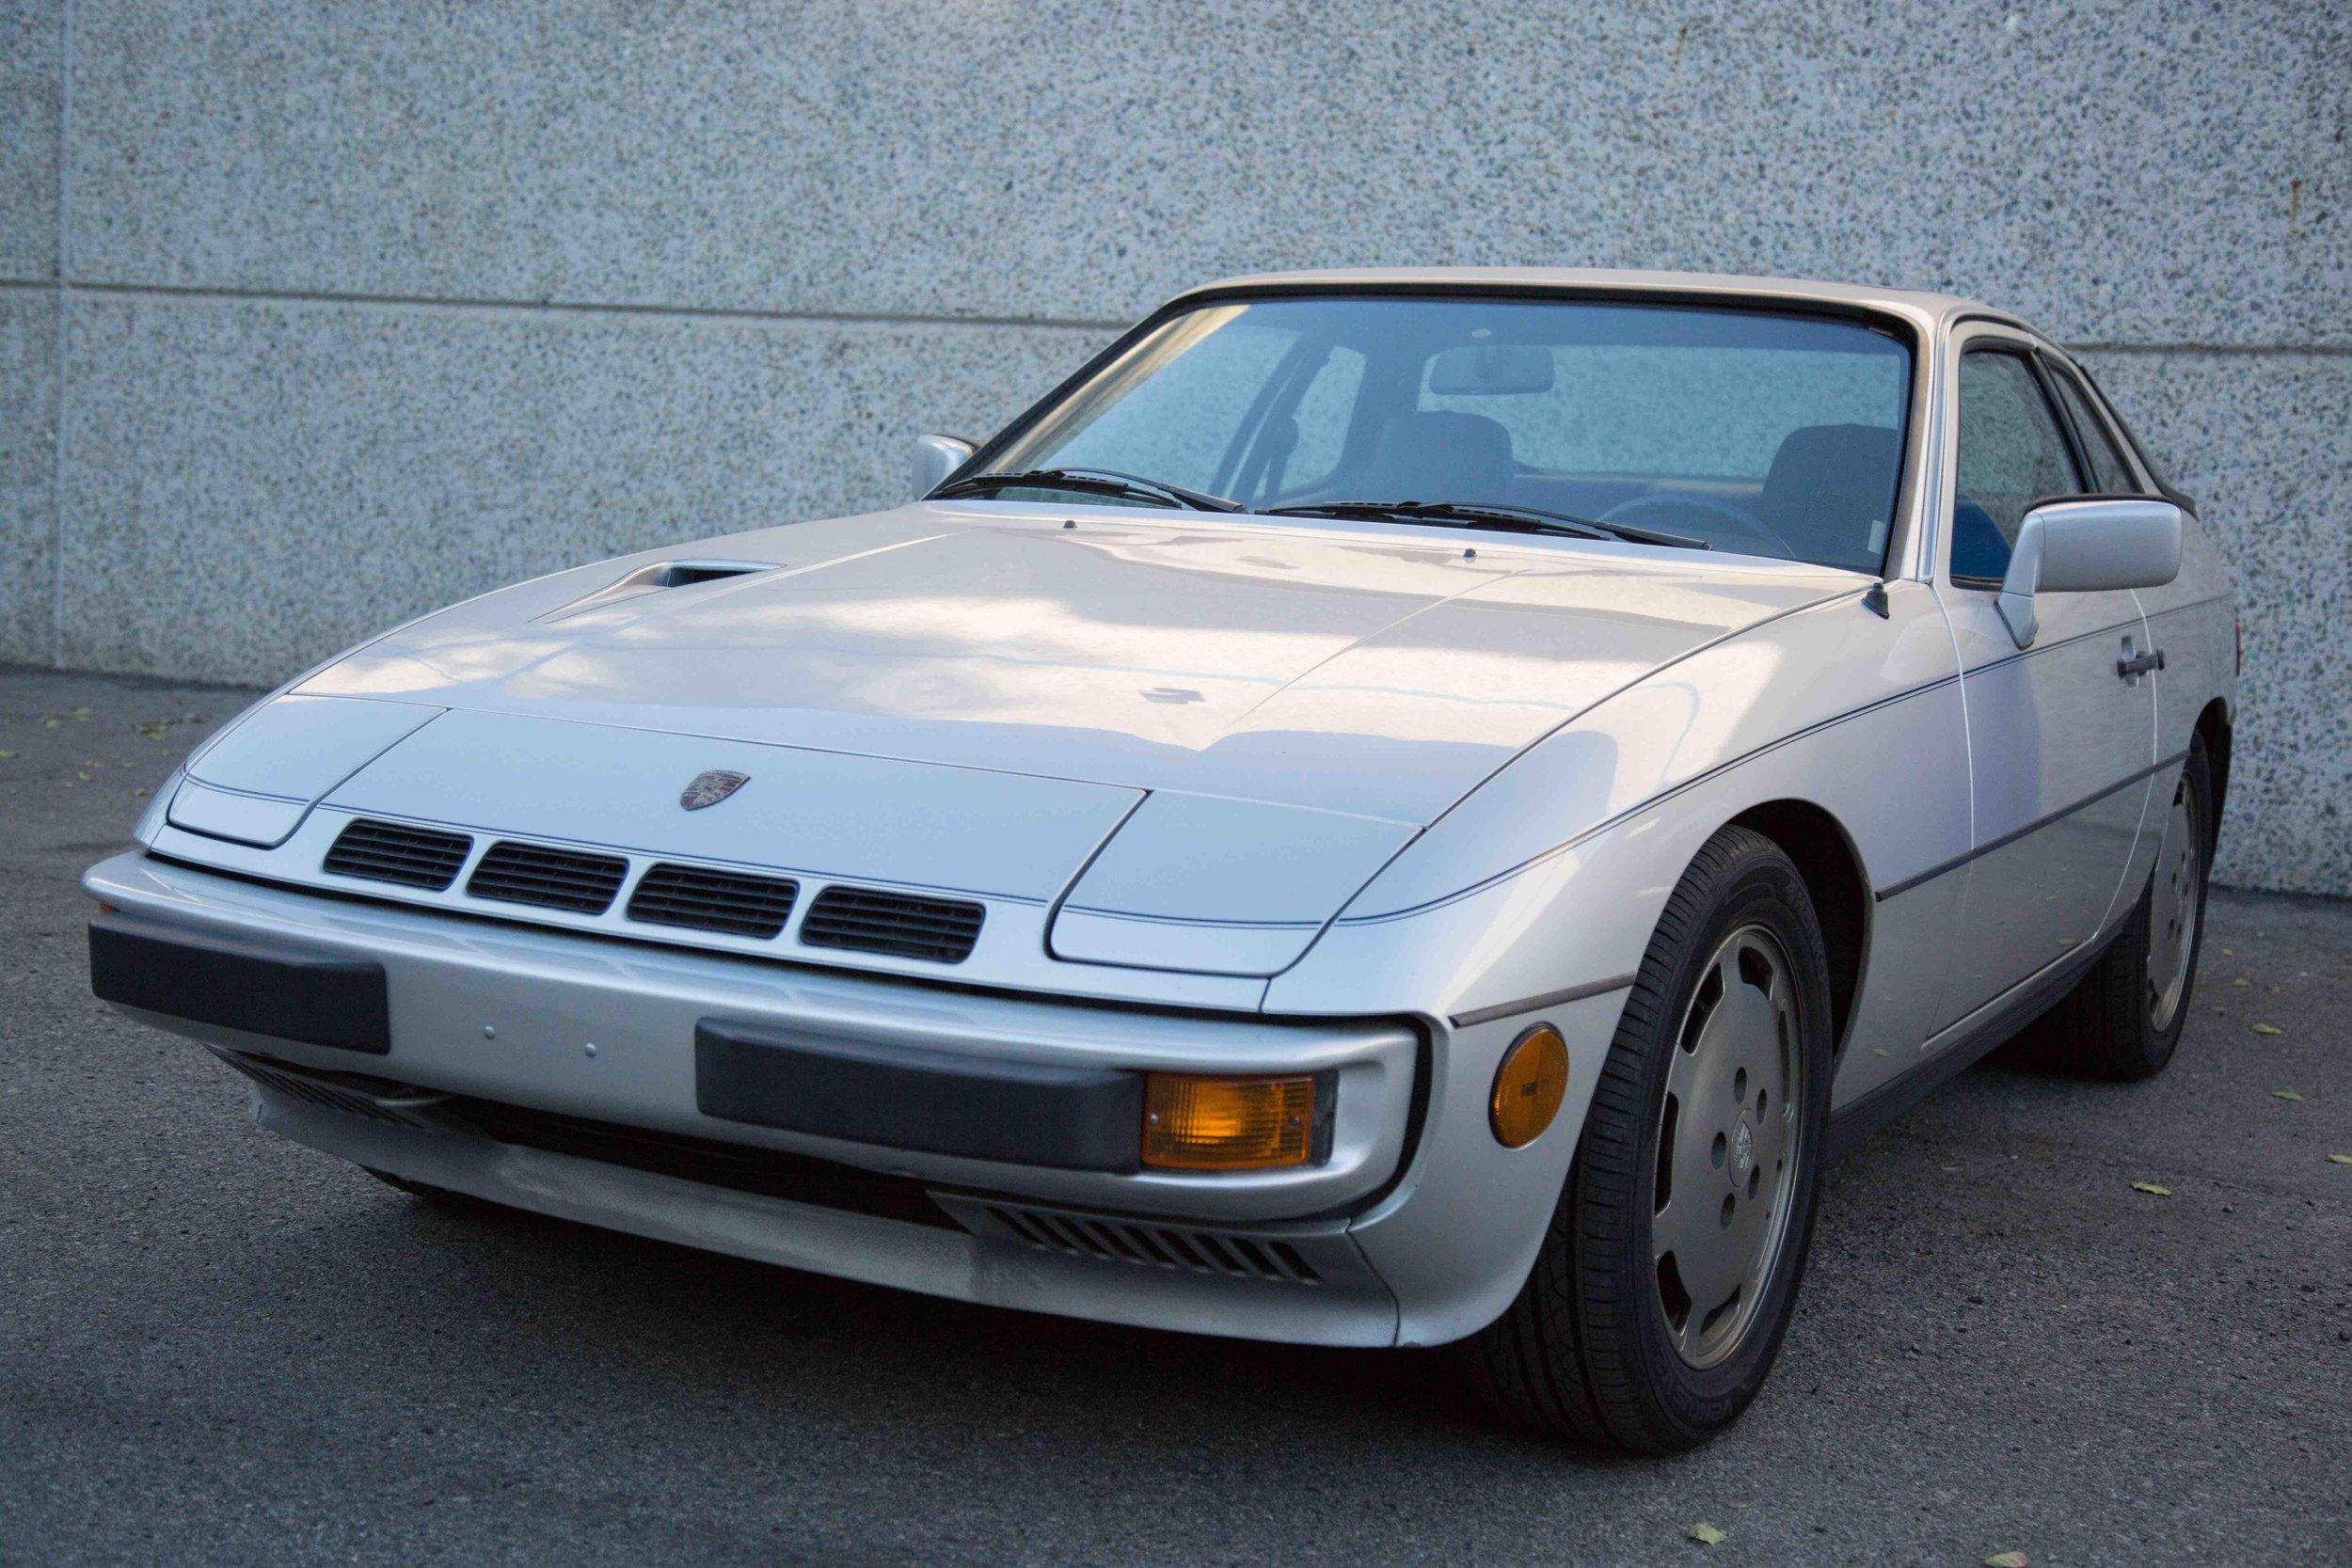 1980-924-Turbo-makellos-classics-for-sale.jpeg